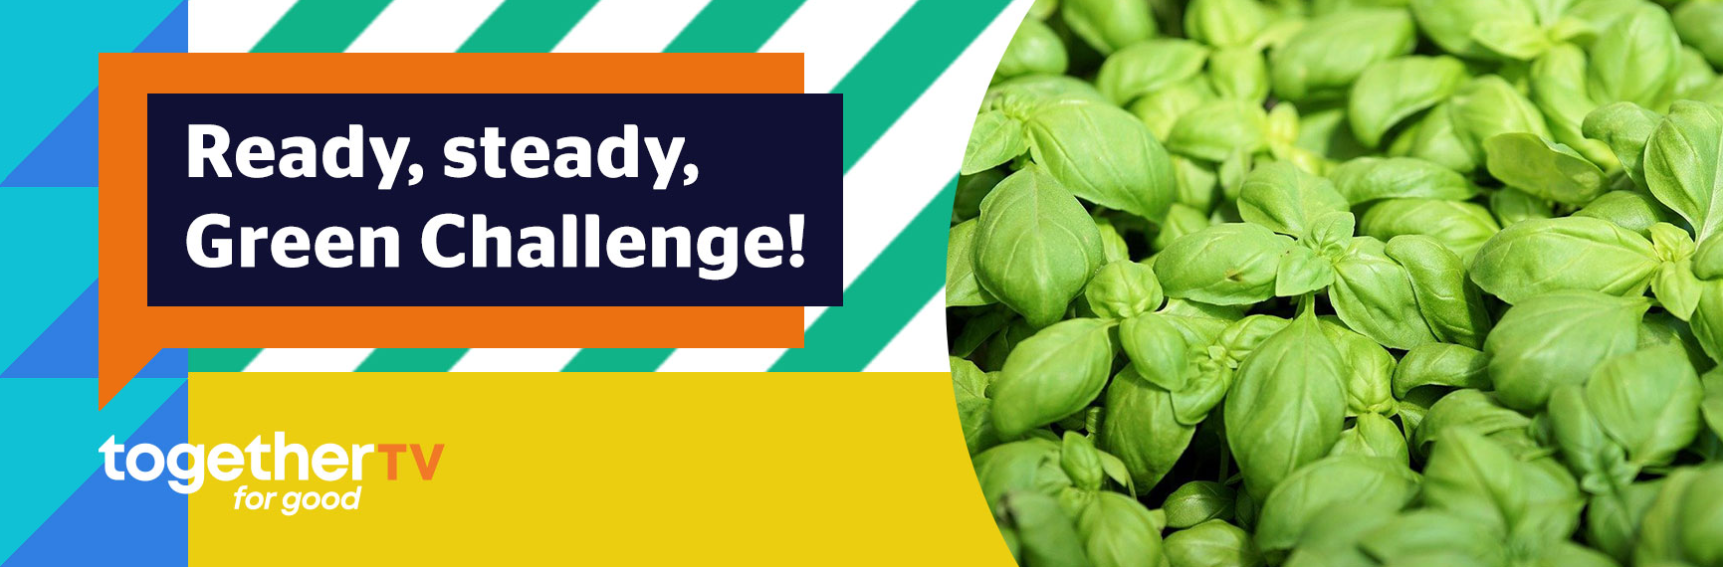 Ready, Steady, Green Challenge